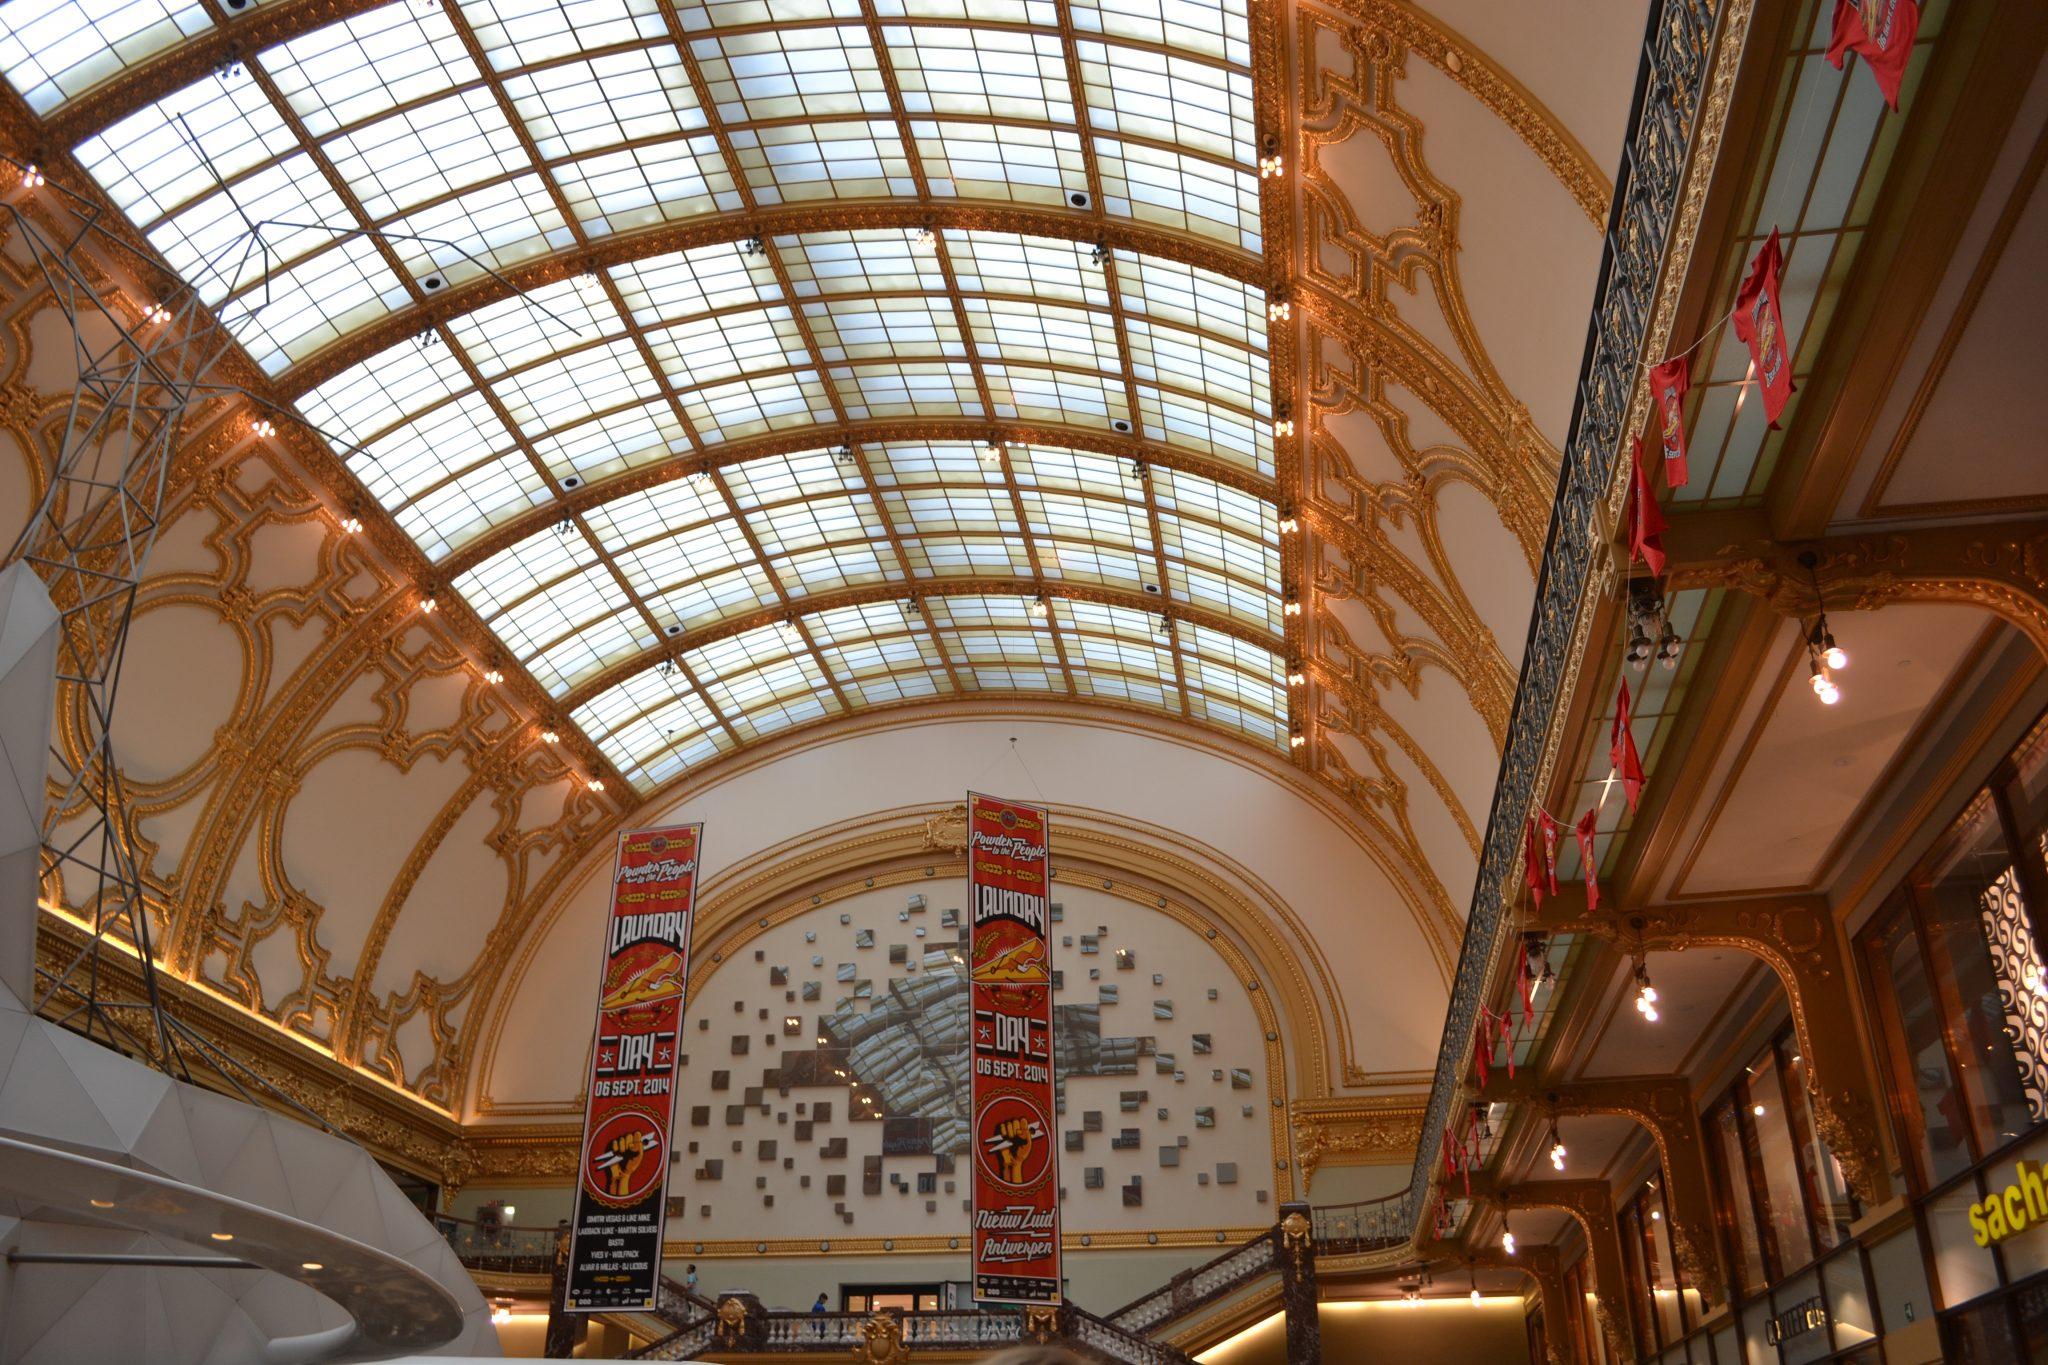 Travel Diary: Antwerpen | Belgium - dsc 0077